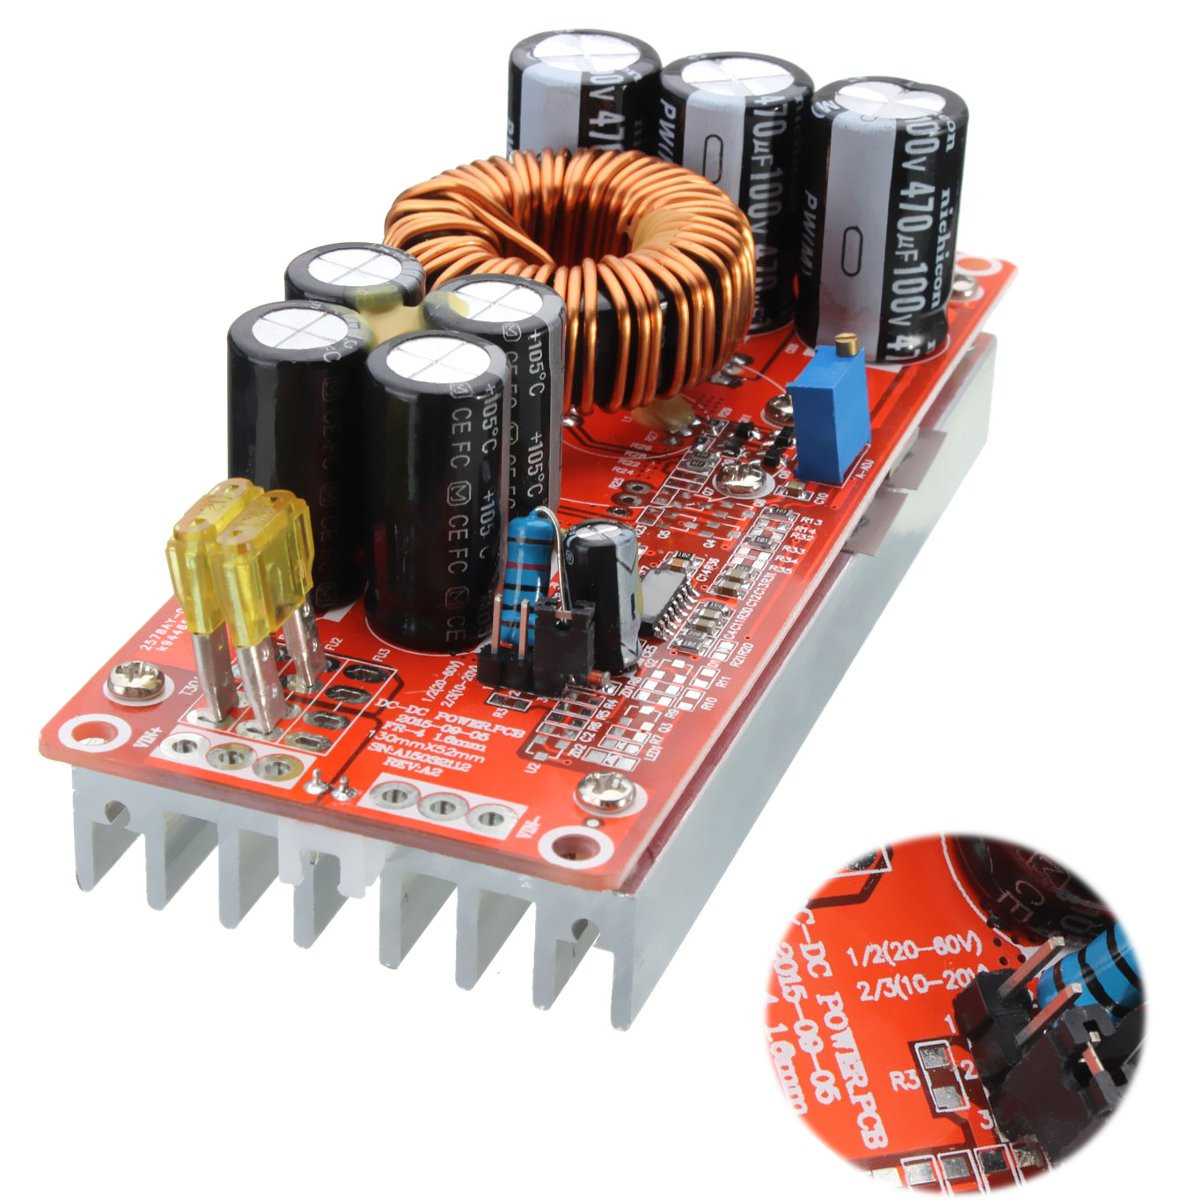 1200 W 20A DC convertisseur Boost Module dalimentation en 10-60 V sortie 12-83 V1200 W 20A DC convertisseur Boost Module dalimentation en 10-60 V sortie 12-83 V